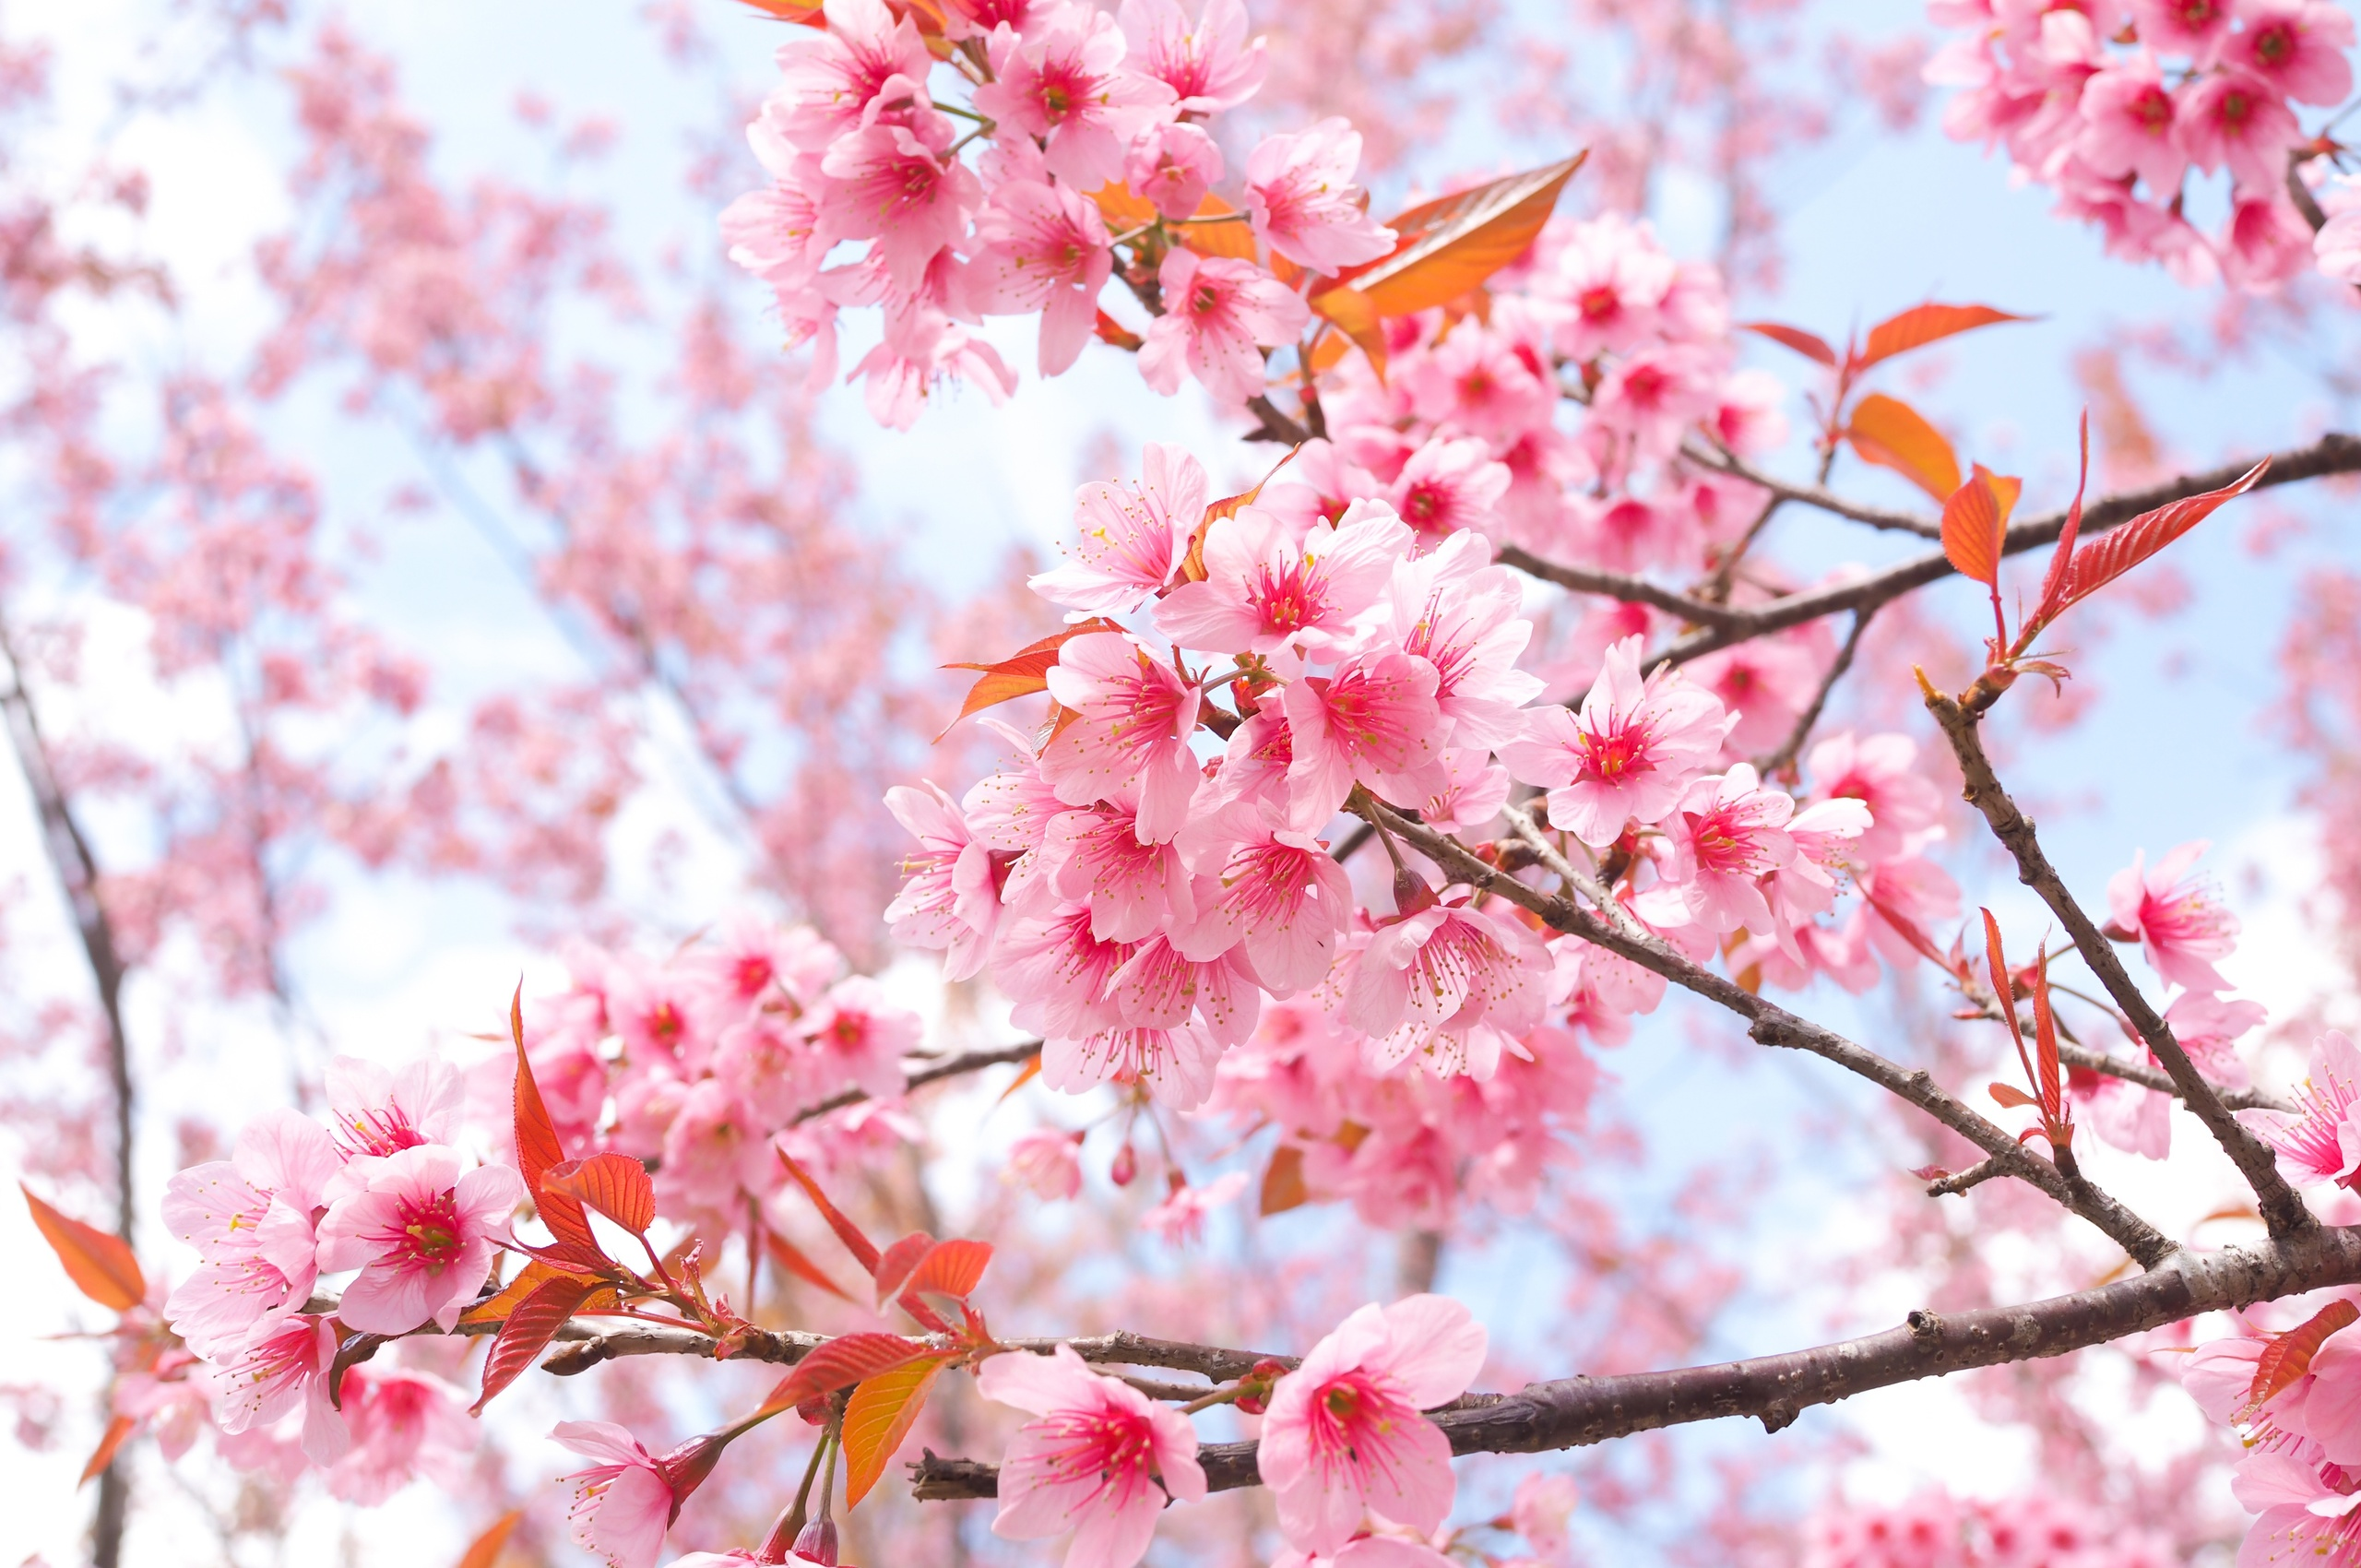 cherry-blossom-tree-branches-4k-8n.jpg